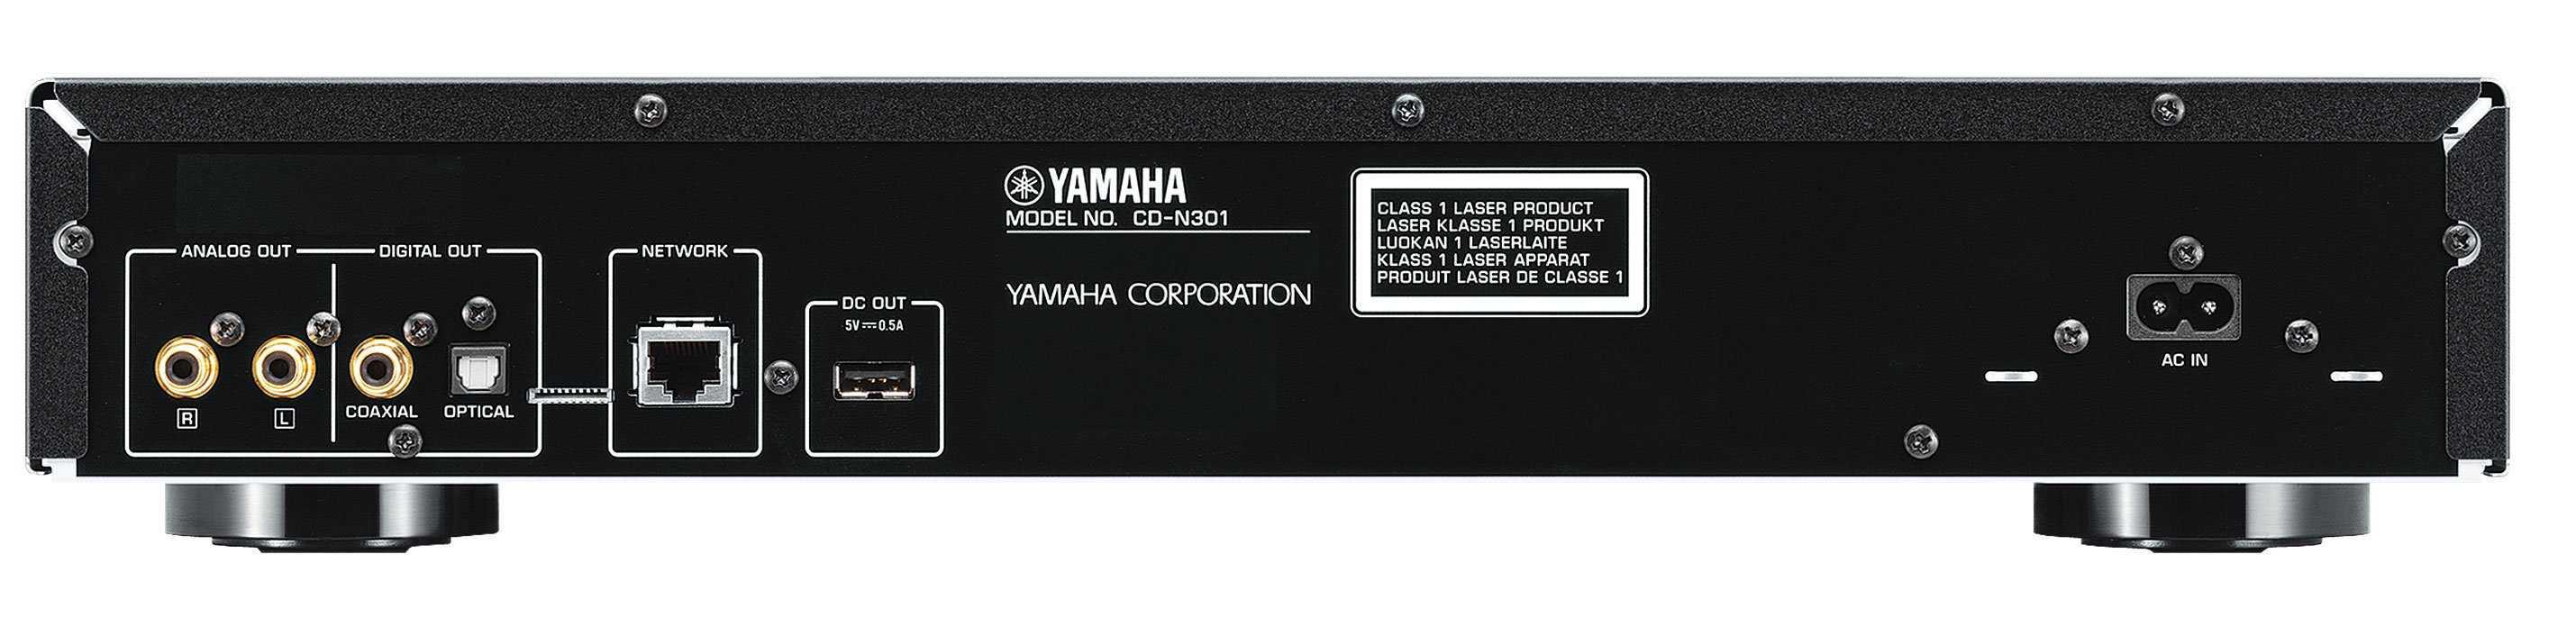 Yamaha CD-N301 Rueckseite